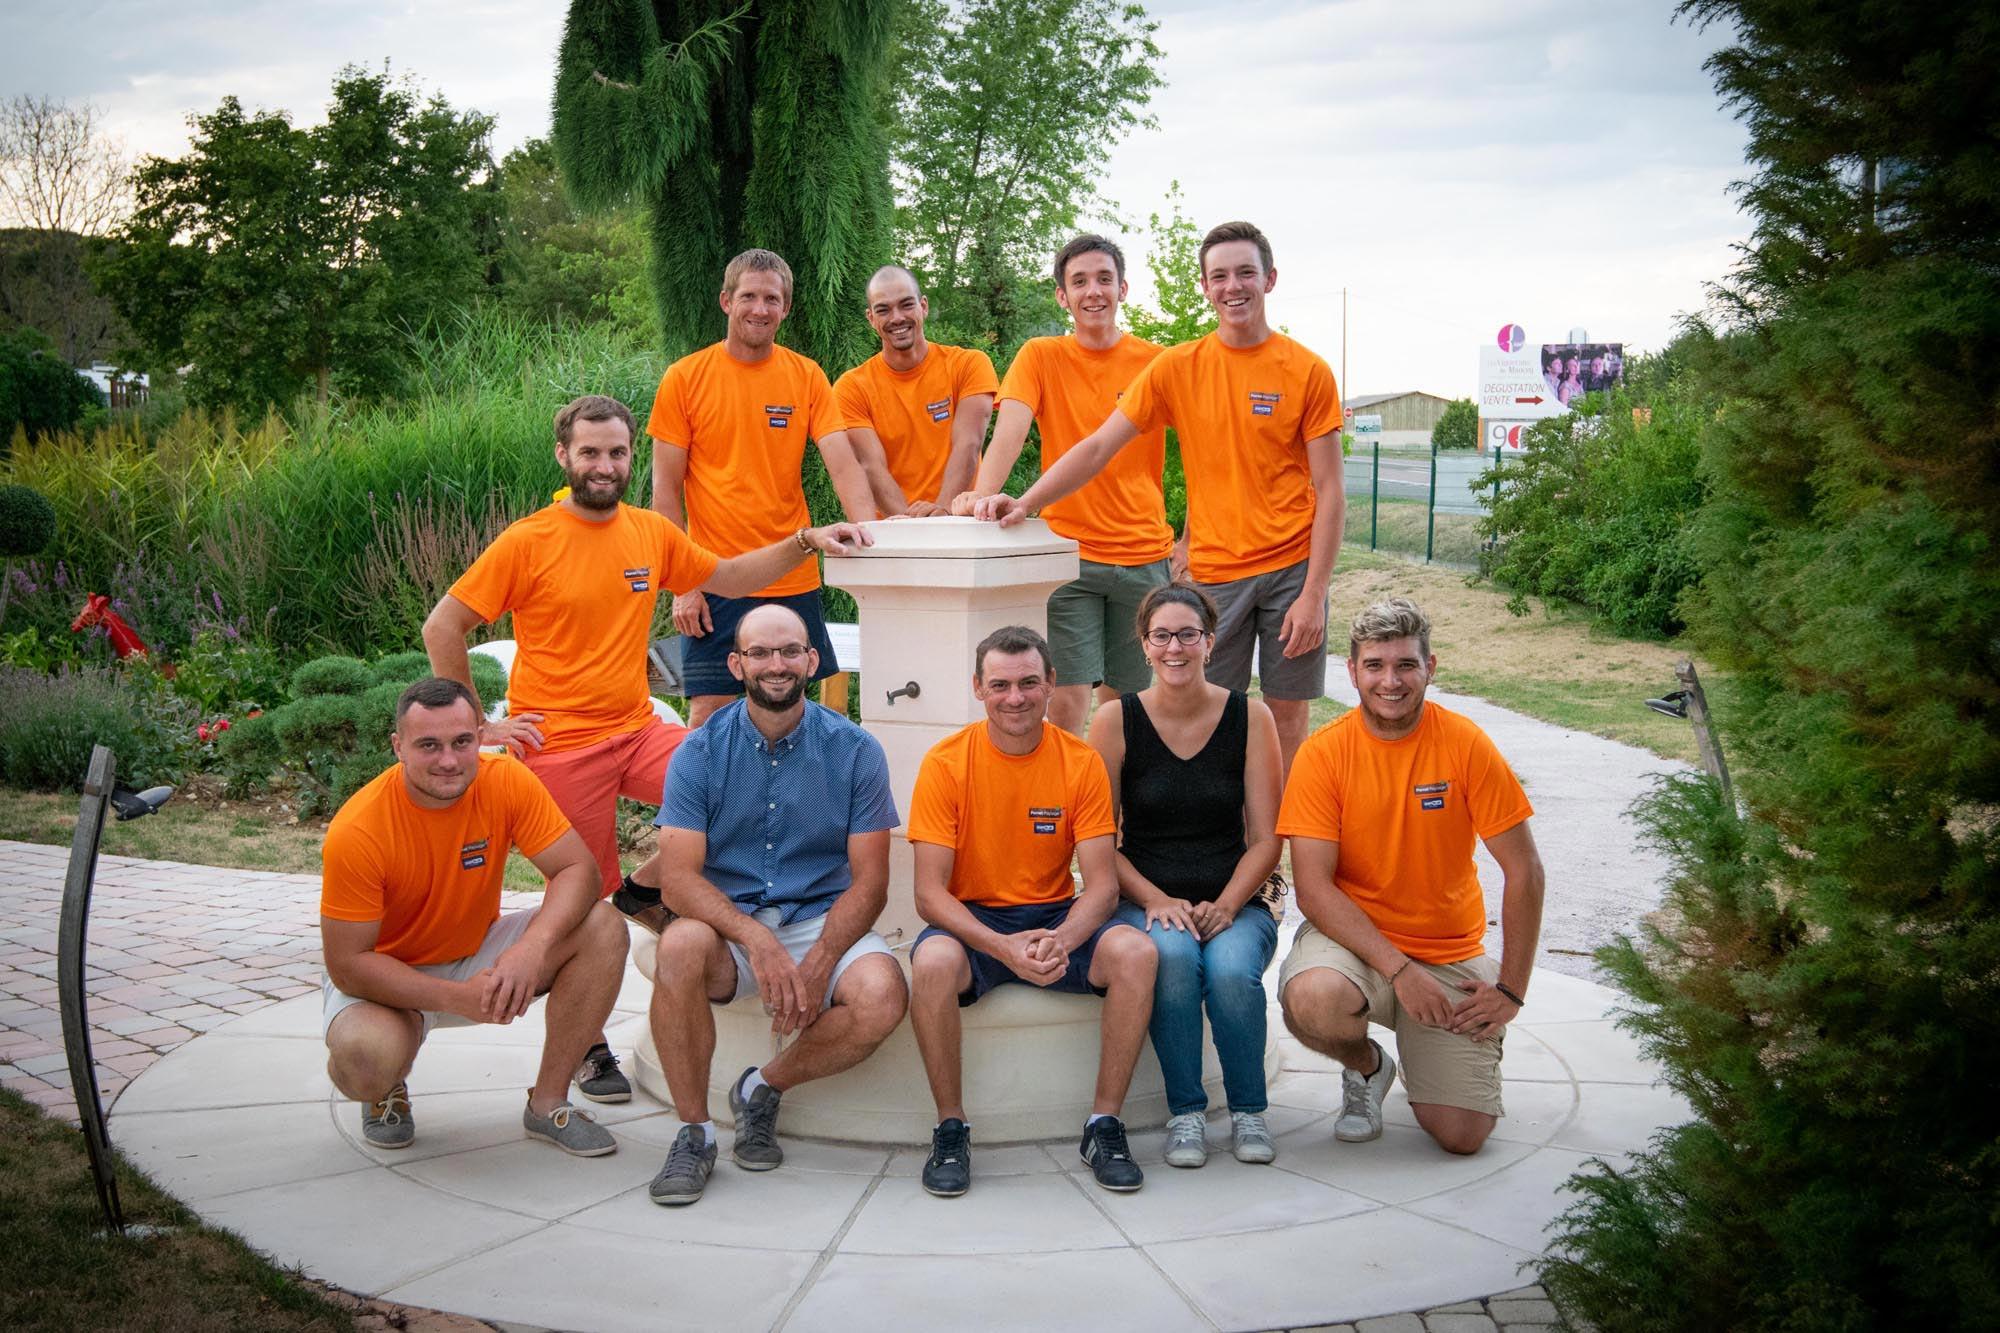 L'équipe Perret Paysage à Tournus